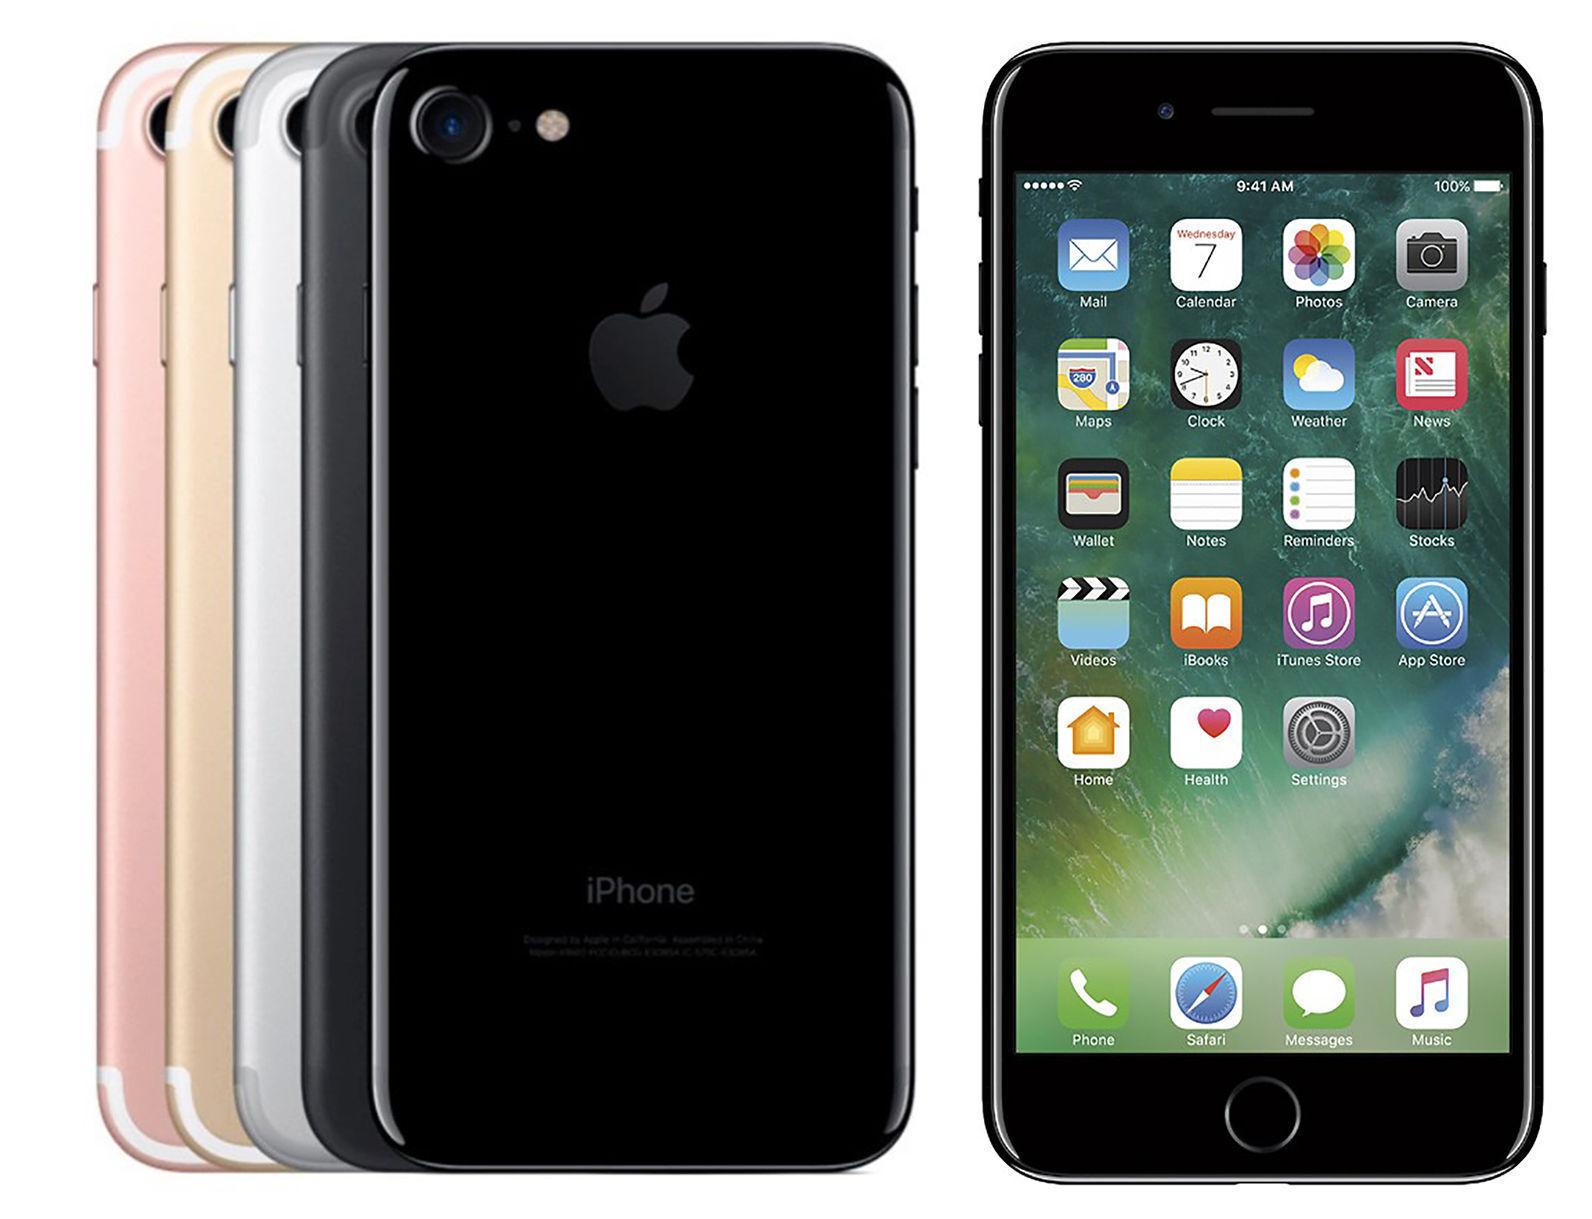 Iphone - Apple iPhone 7 32GB 128GB 256GB A1778 GSM UNLOCKED Black Jet Gold Silver